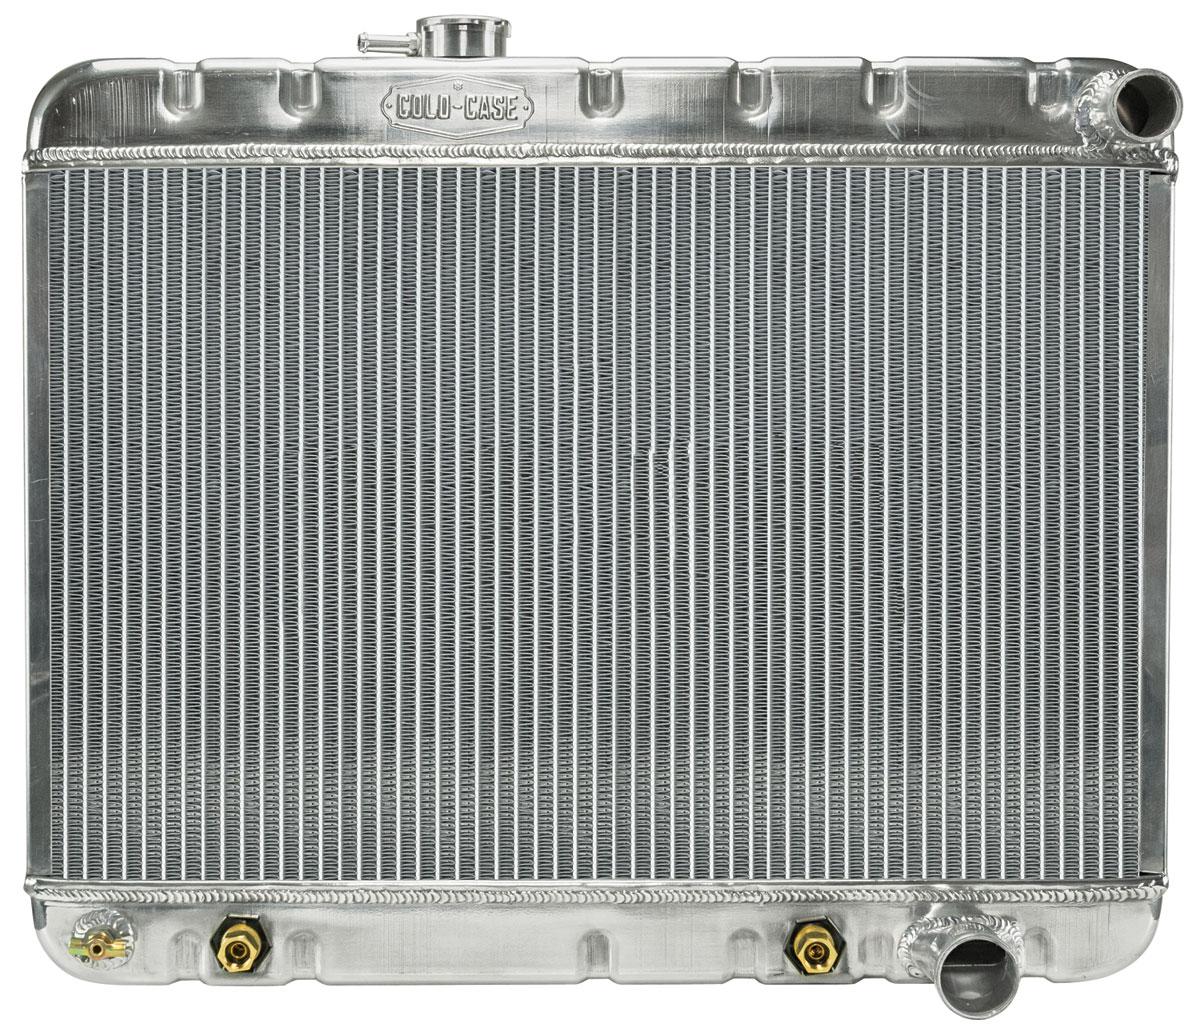 Radiator, Aluminum, Cold-Case, 1964-65 GTO, A/C, AT